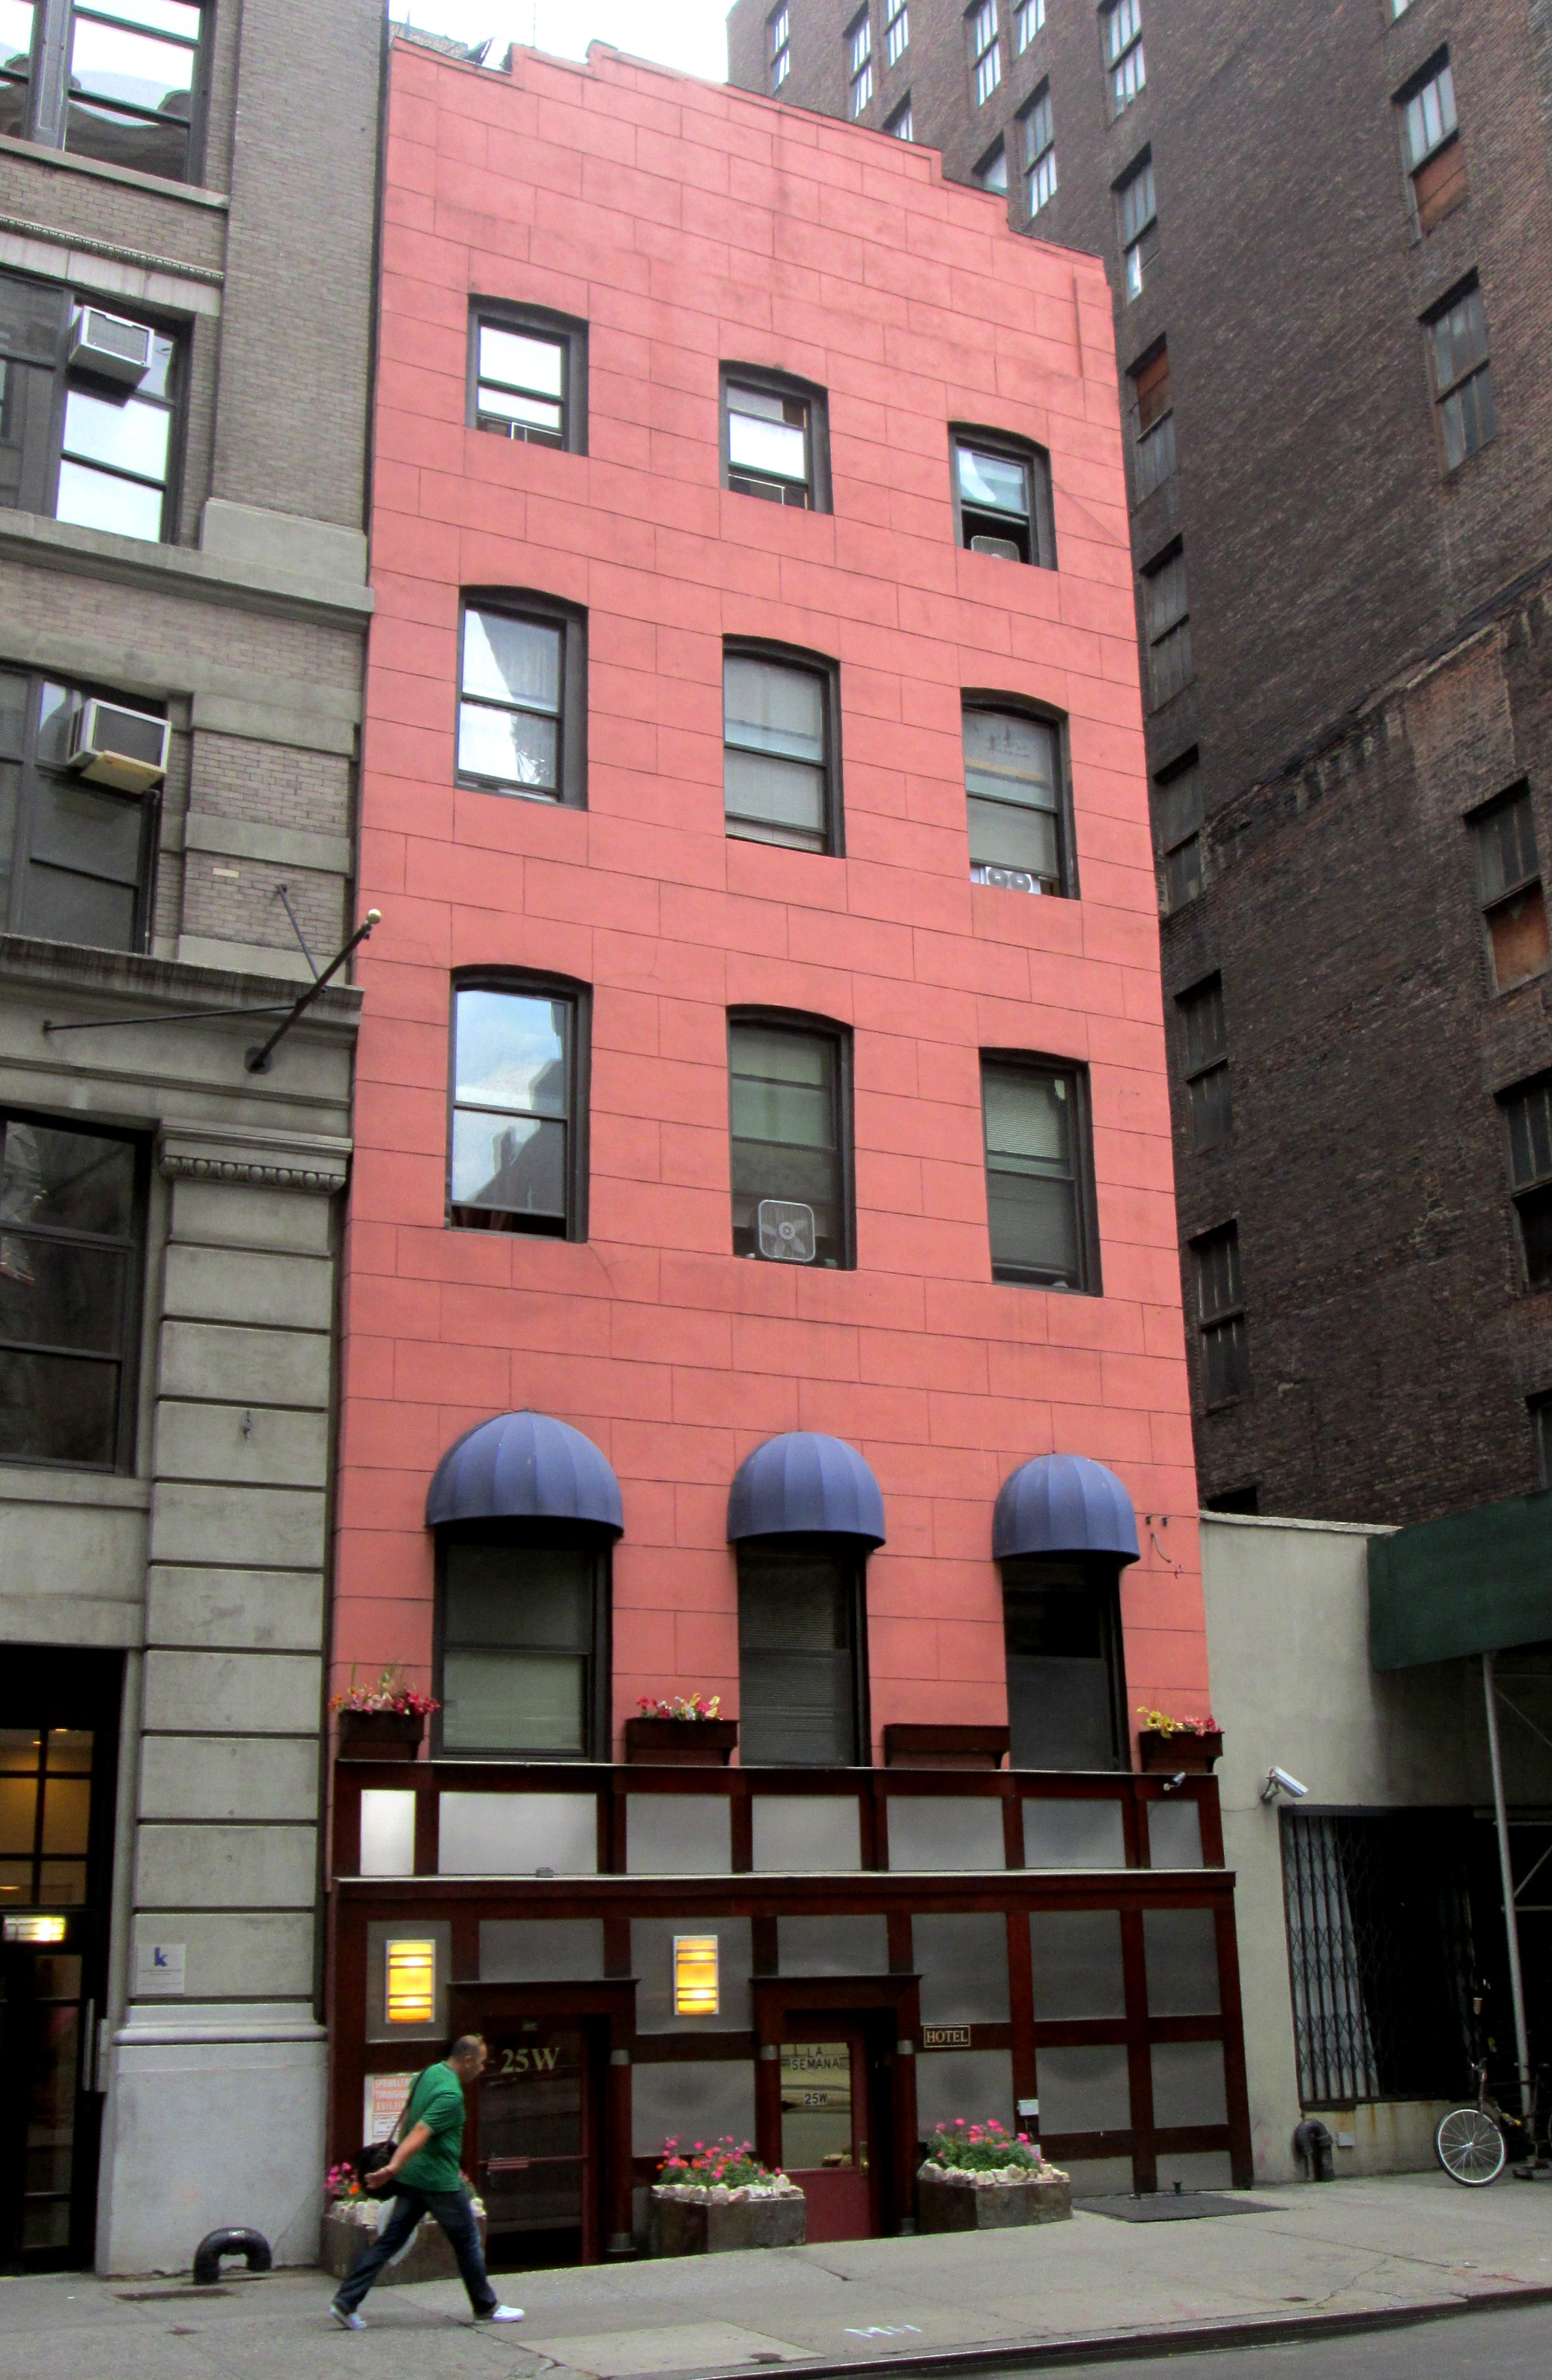 25 West 24th Street